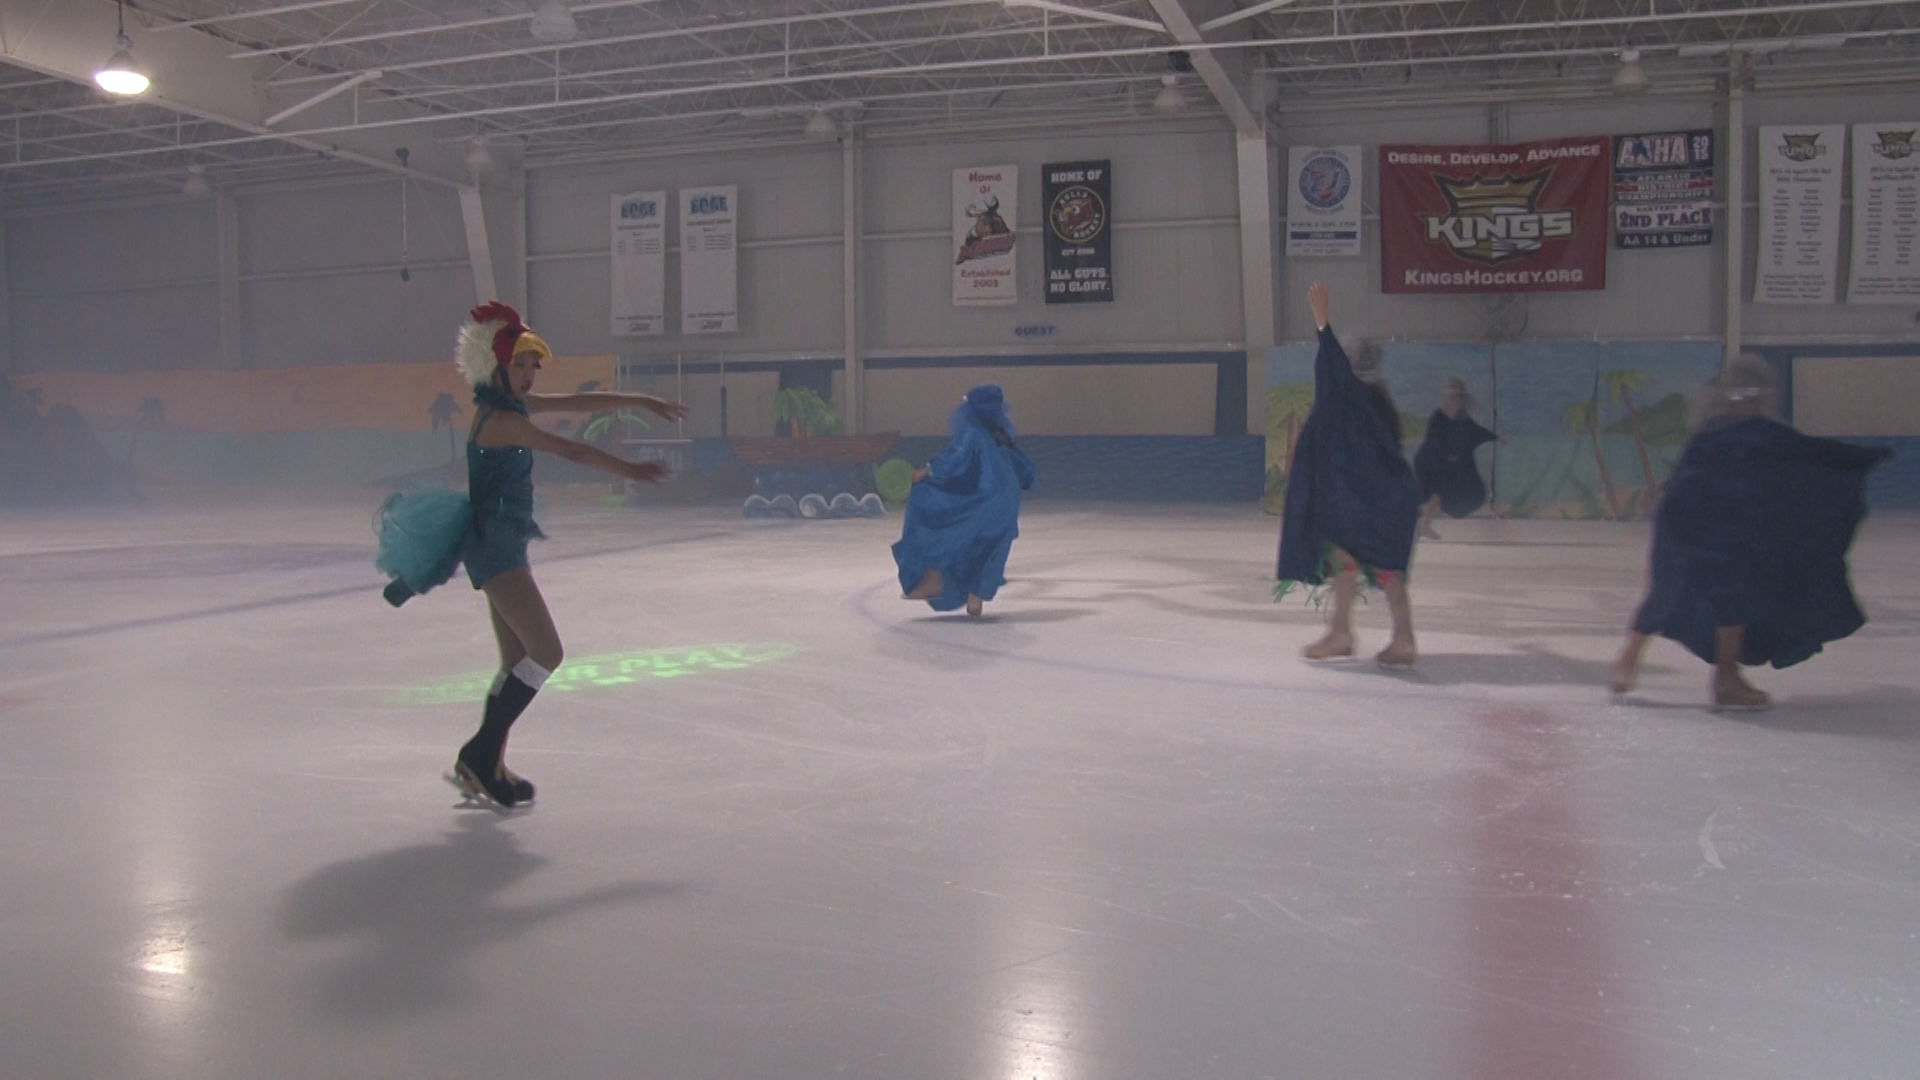 Power Play Maui Skate on Ice 071417.00_28_48_10.Still046.jpg